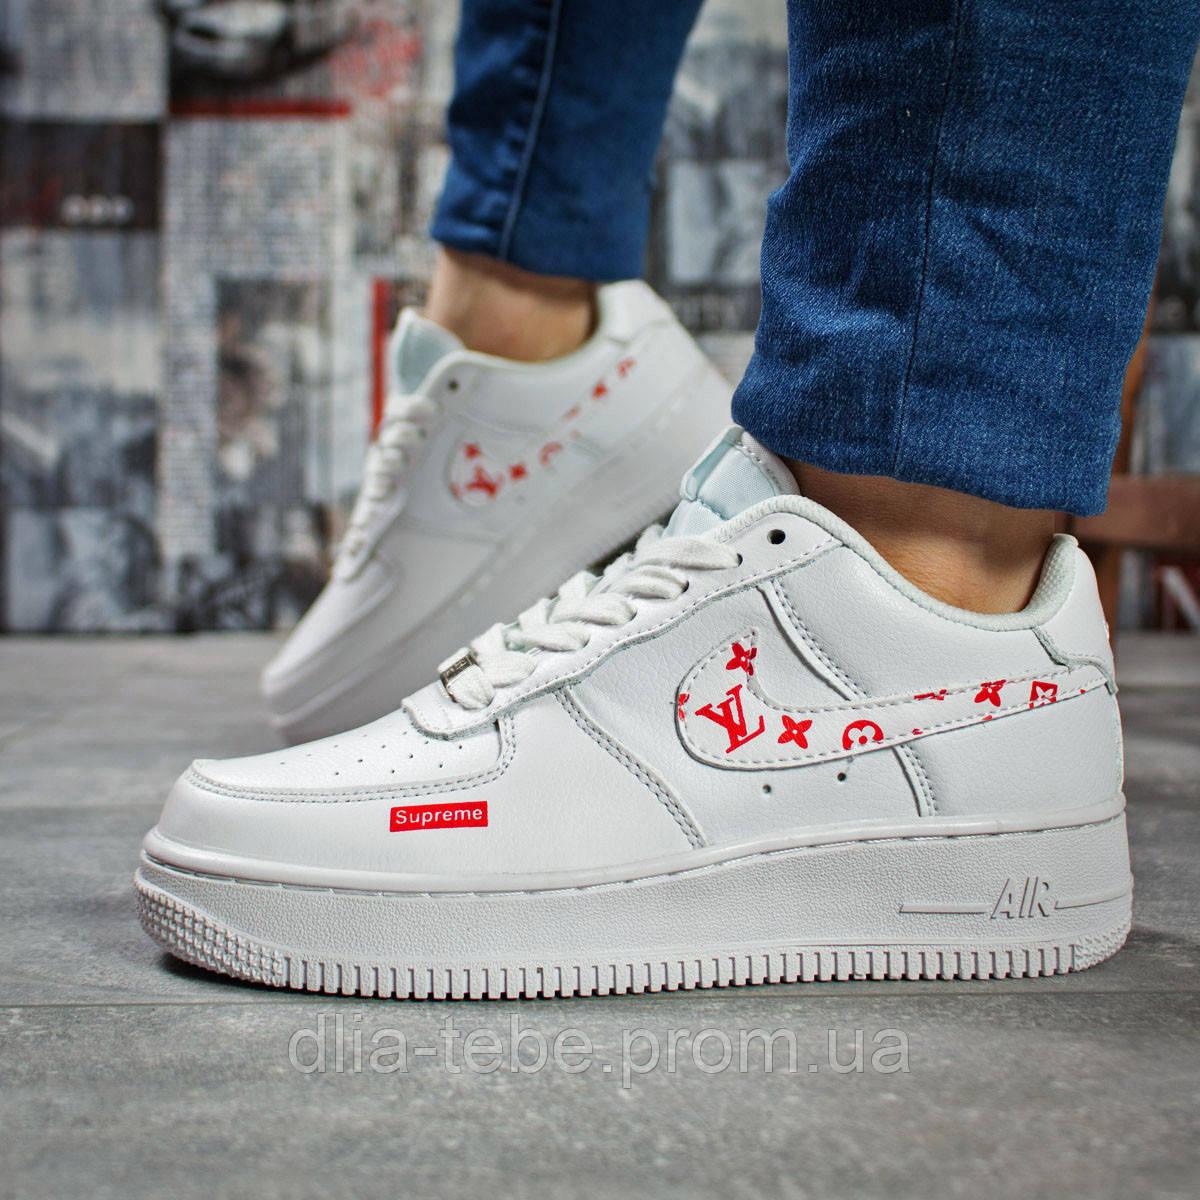 14c1b781 Кроссовки Женские Белые Nike Air (в Стиле) [ 36 37 38 39 40 ] — в ...